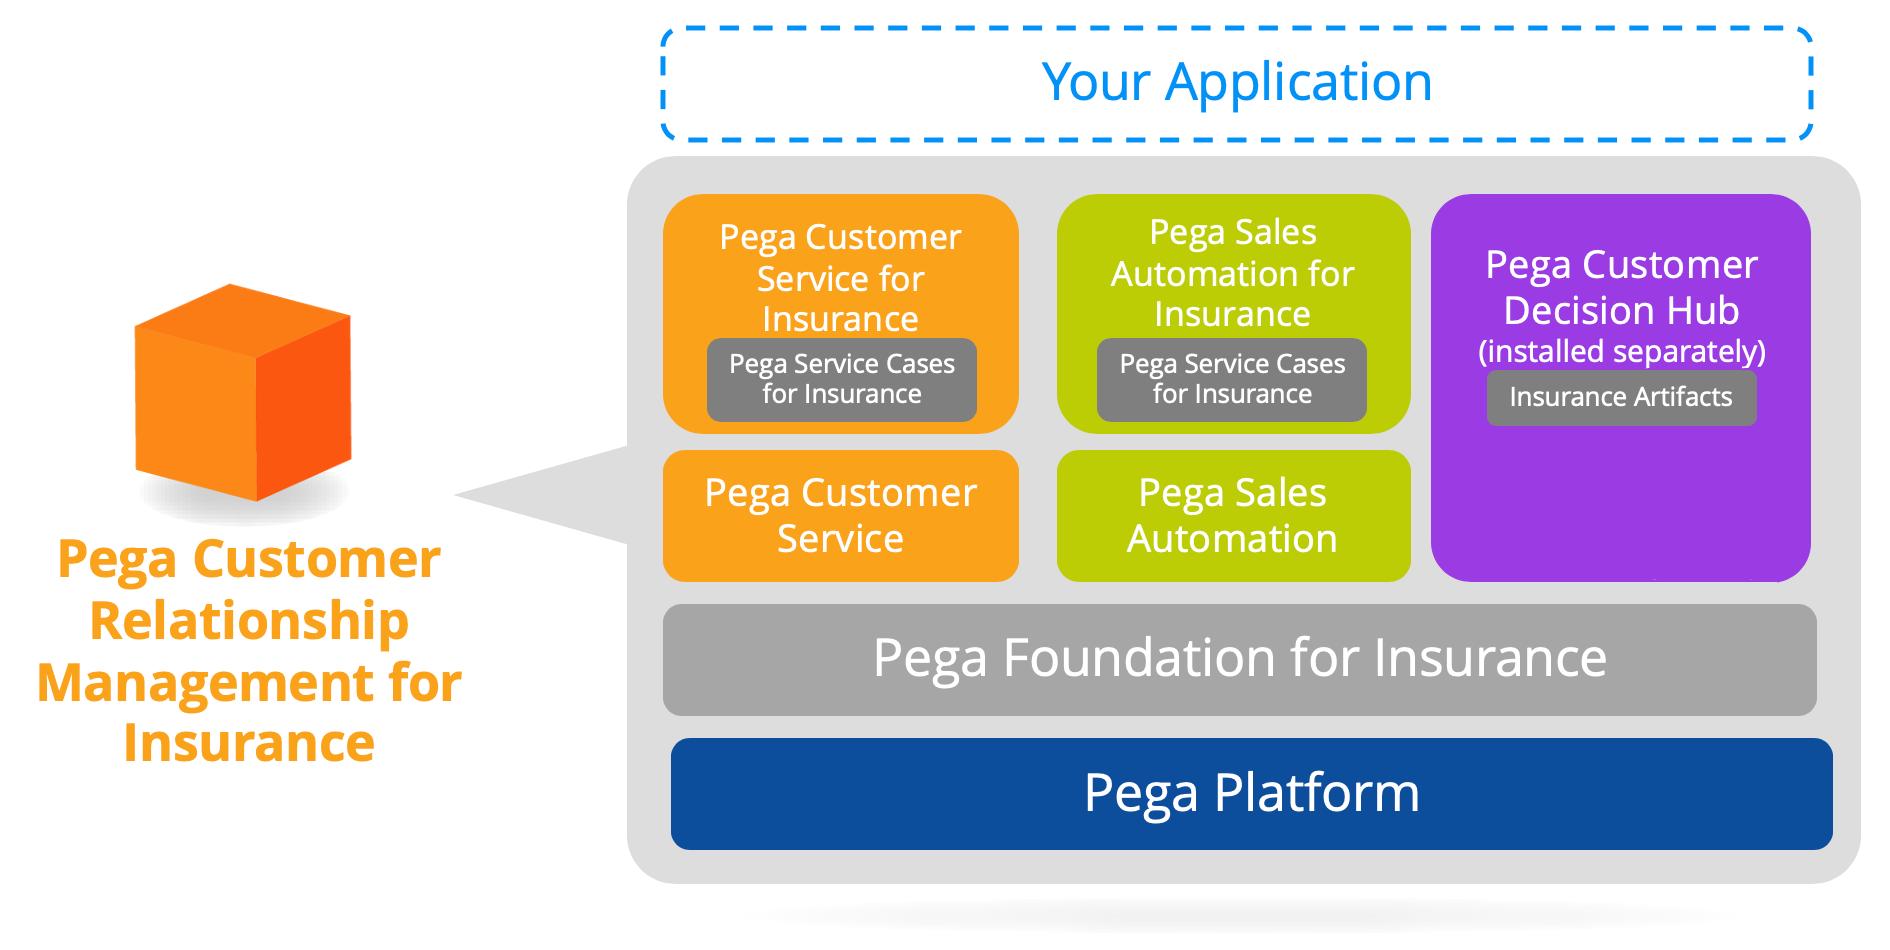 Pega Customer Relationship Management for Insurance application stack